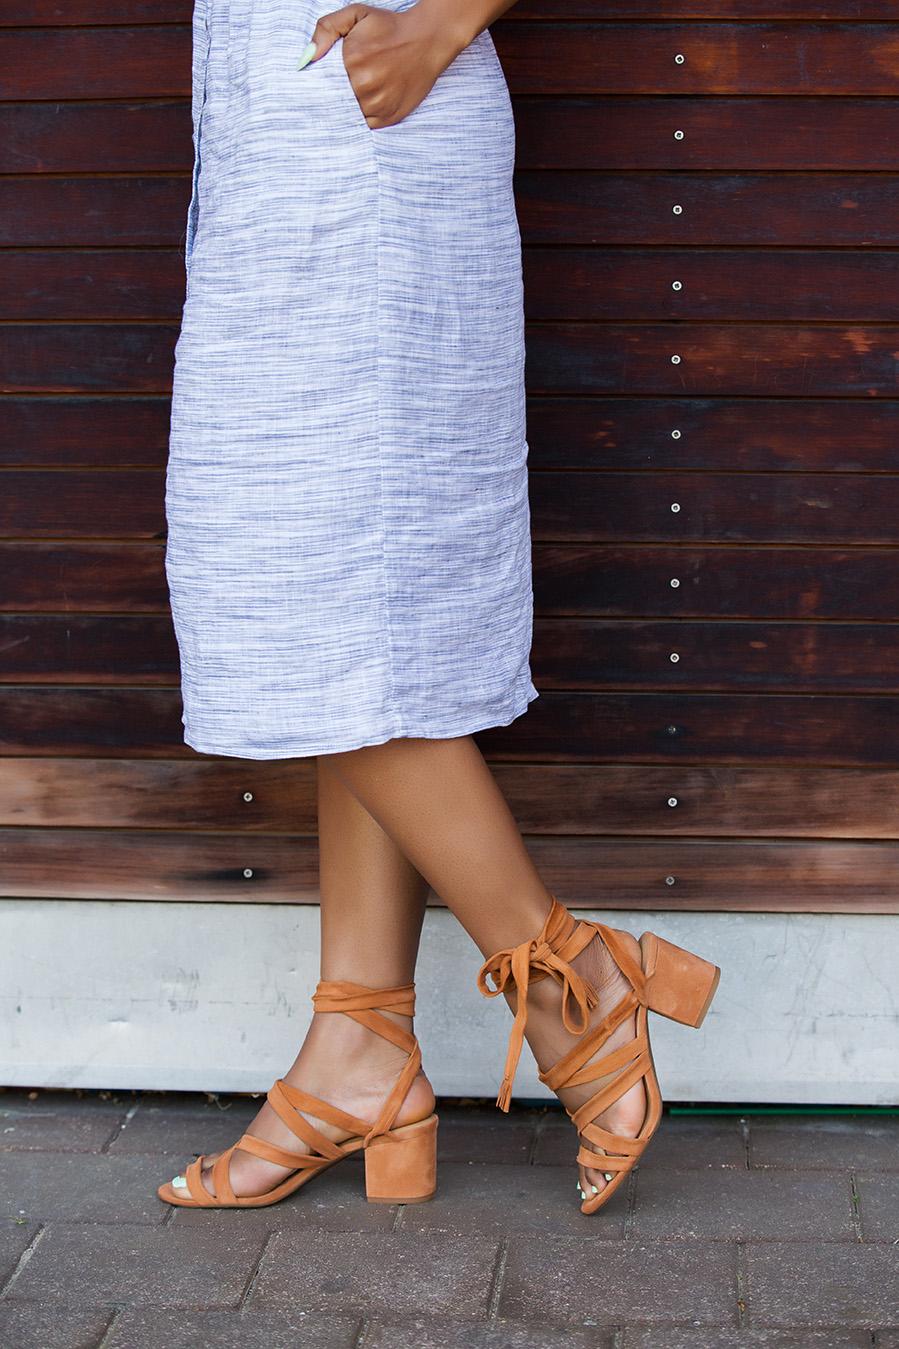 Lucky Brand Idalina strappy heels, www.jadore-fashion.com